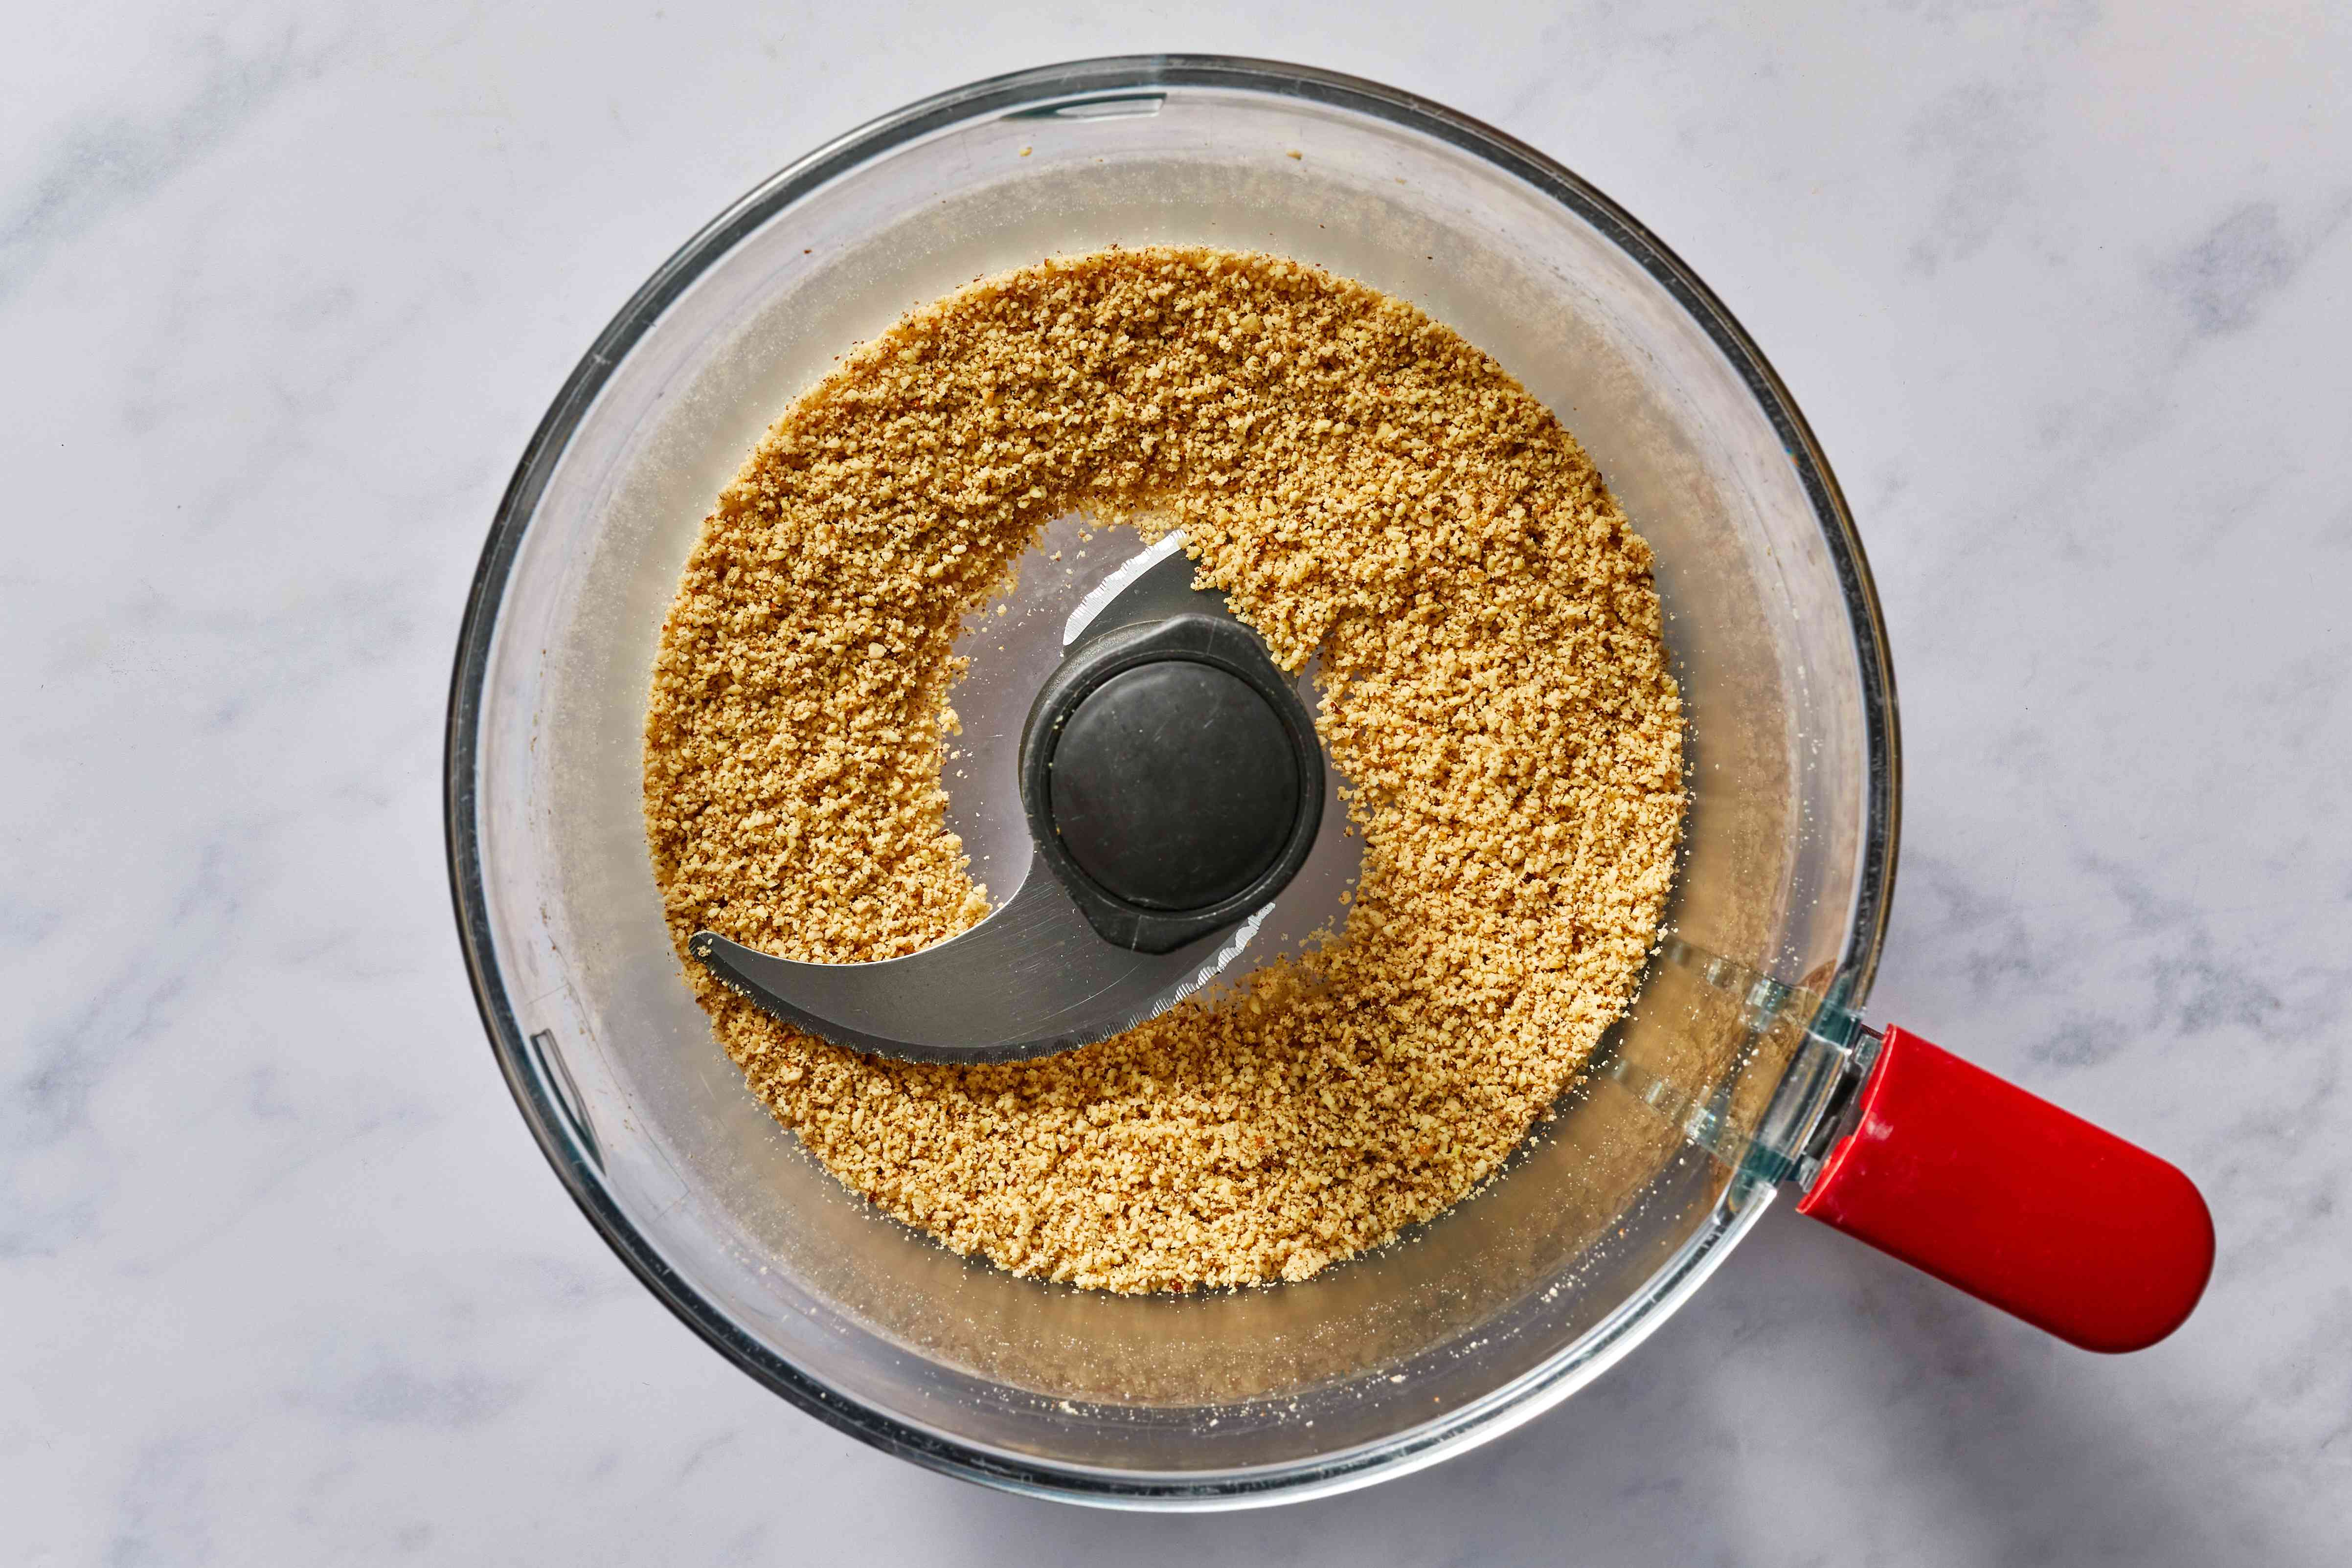 almonds in a food processor